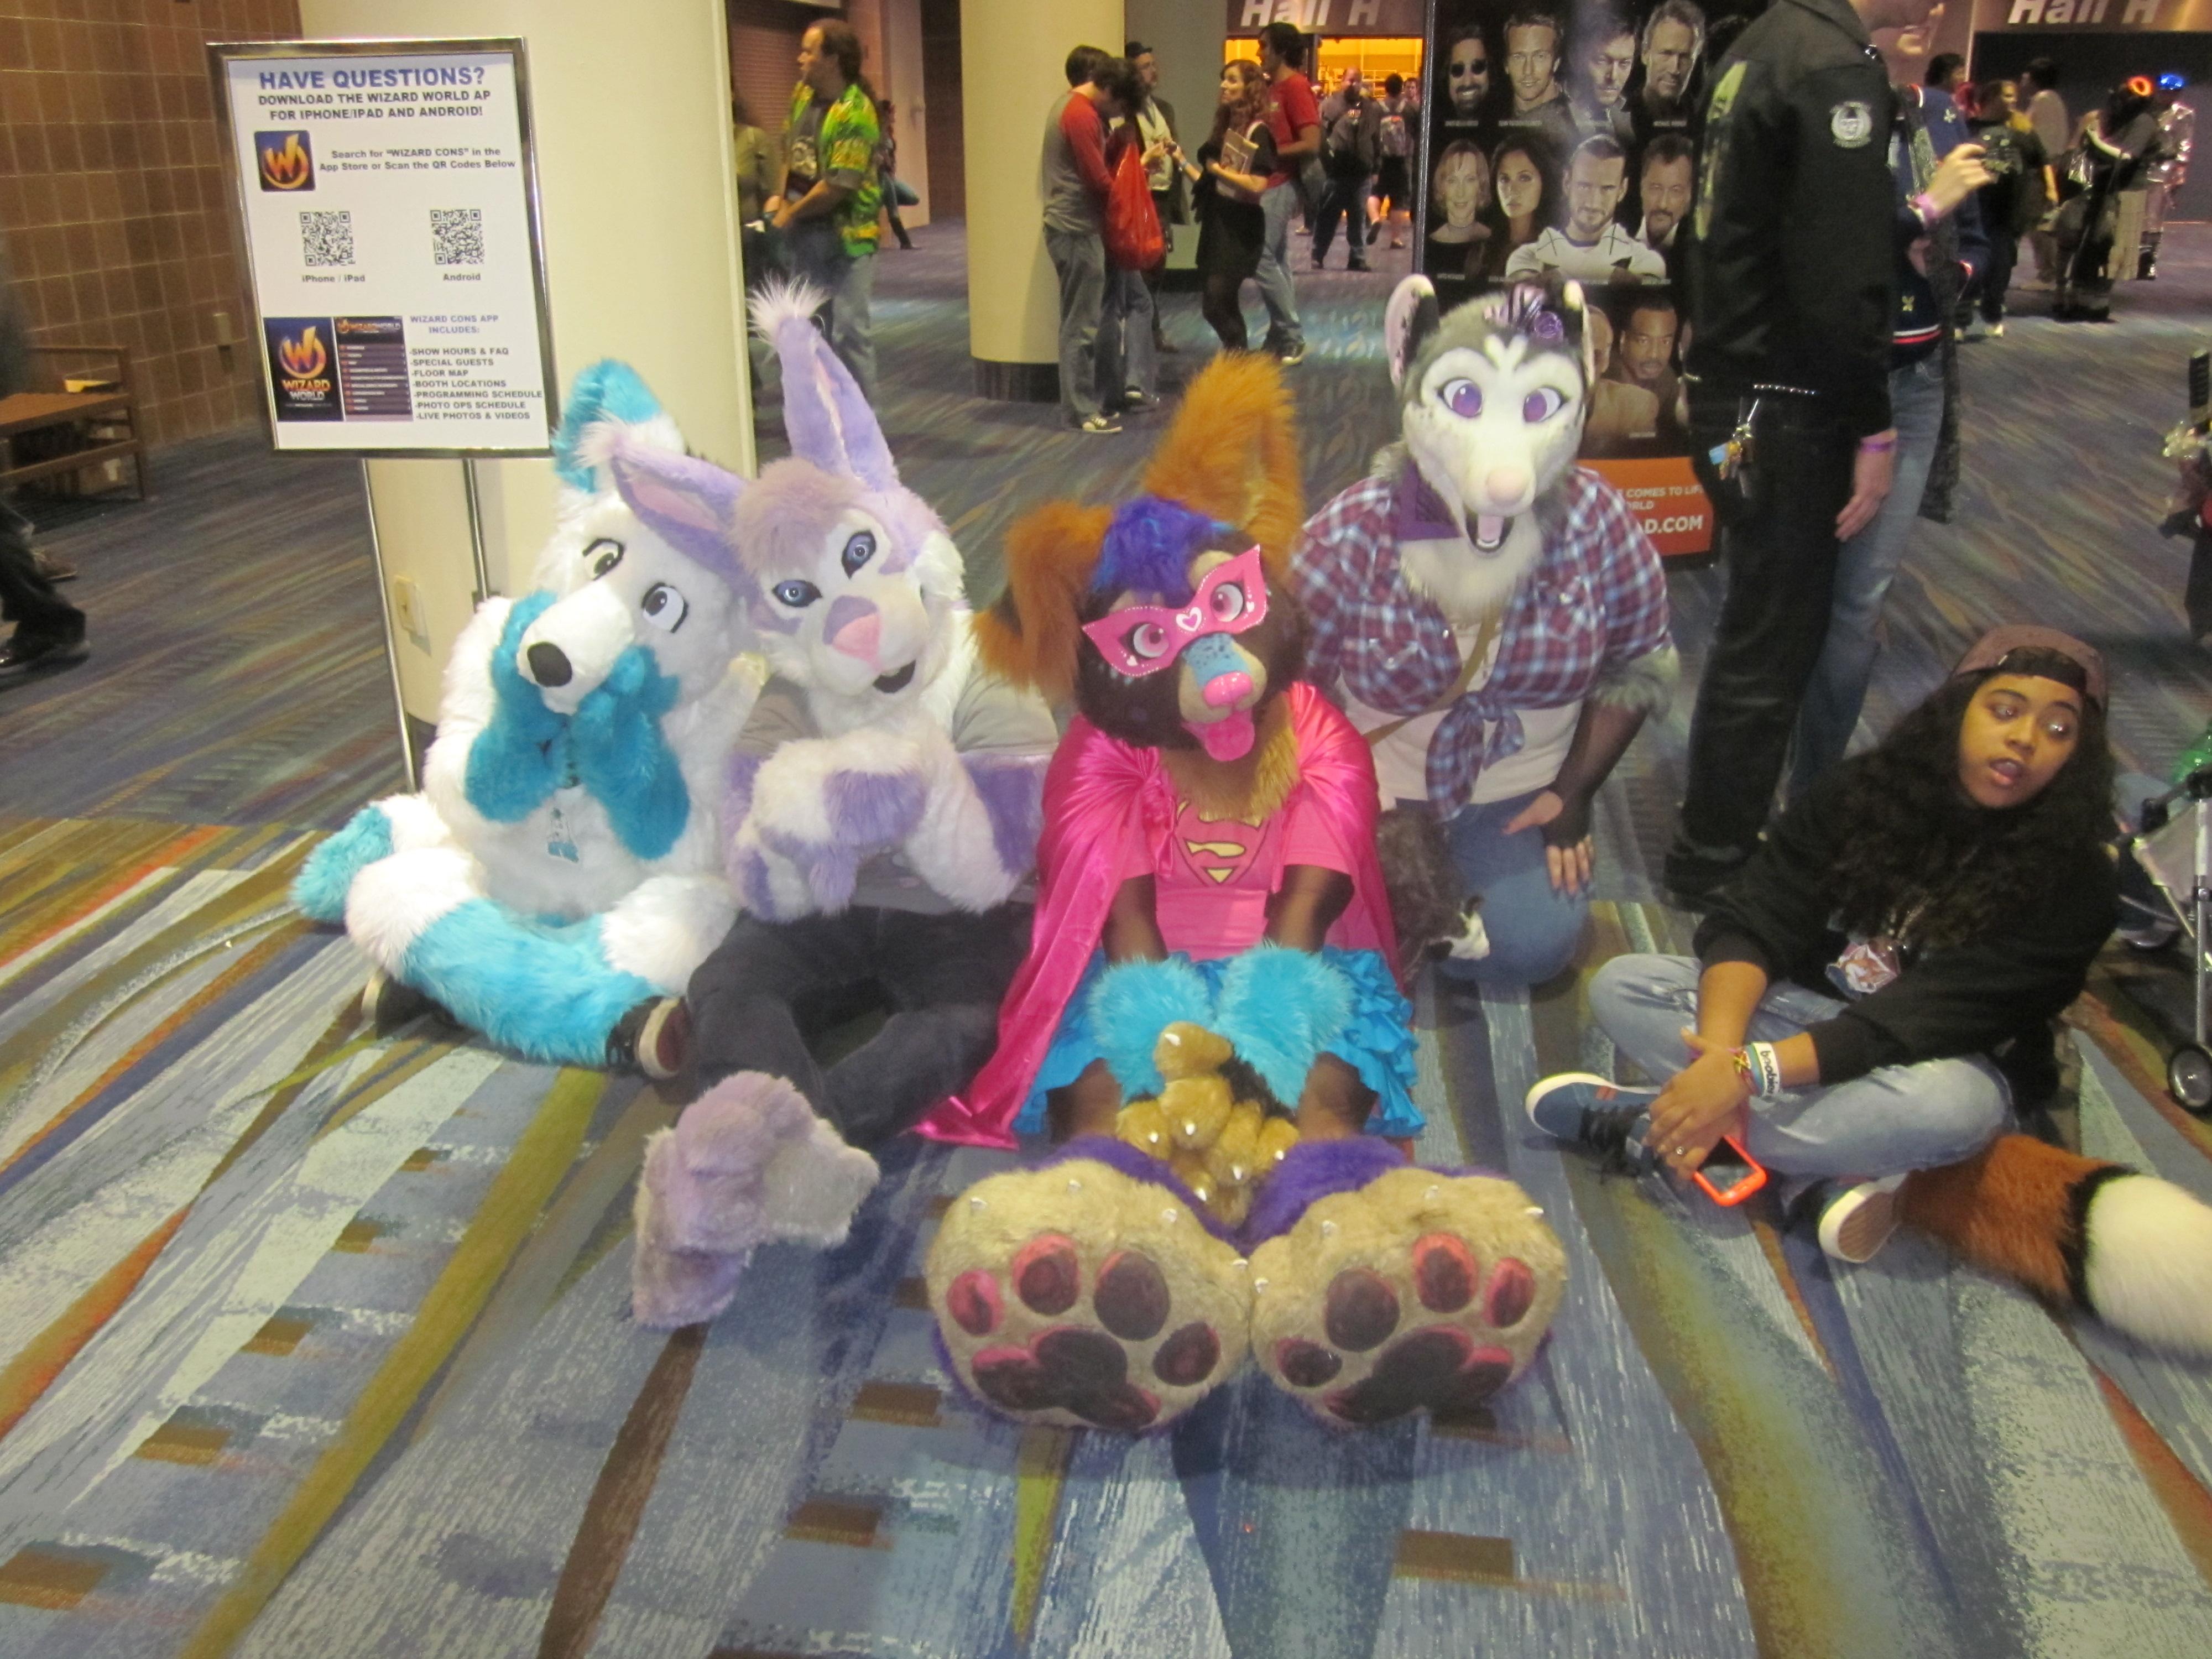 File:Comic Con Furries.JPG - Wikimedia Commons